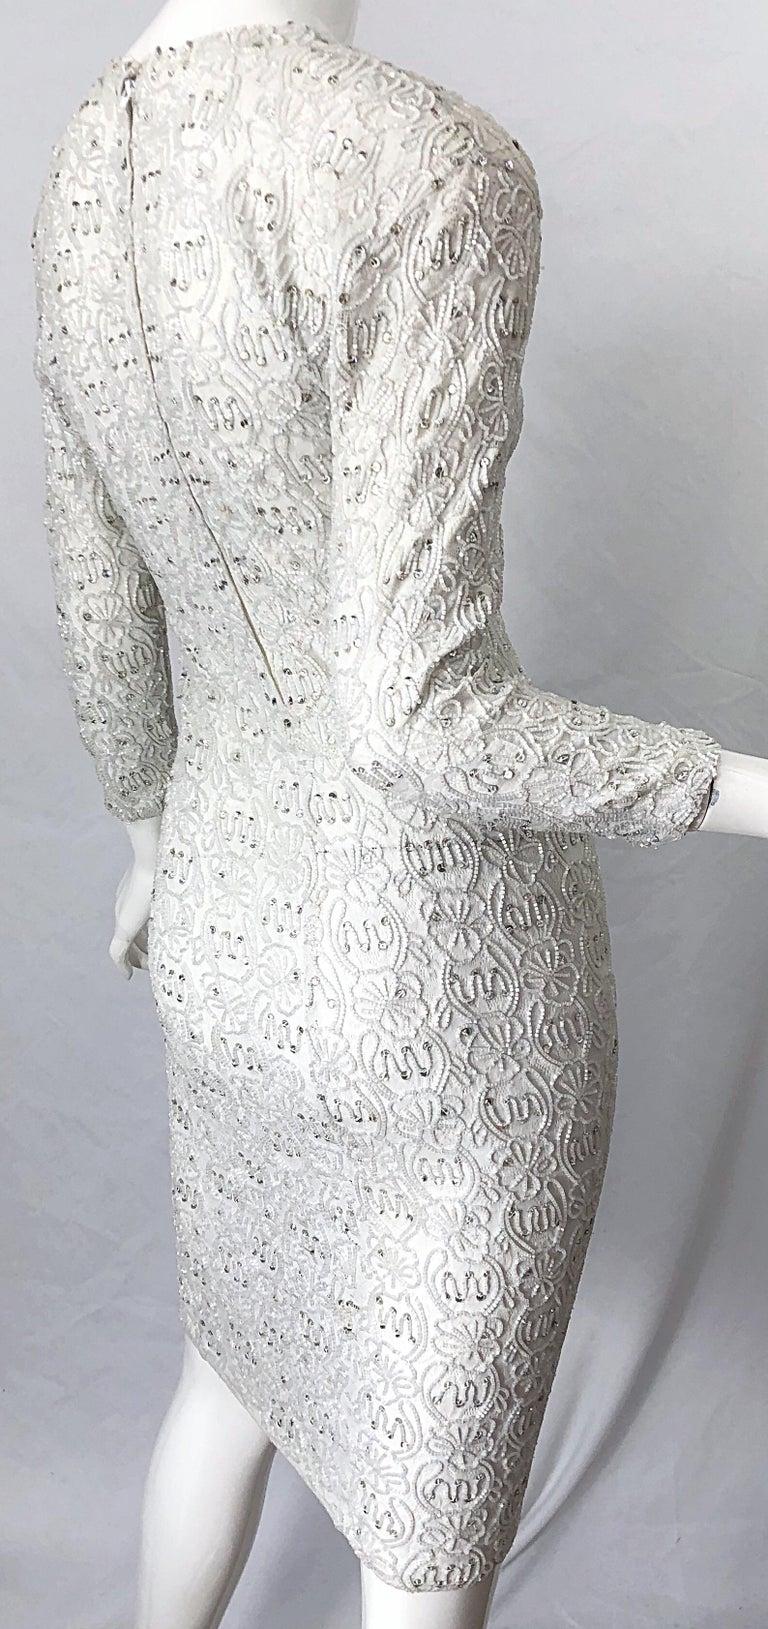 1980s Giorgio di Sant Angelo White Beaded Rhinestone Vintage 80s Bodycon Dress For Sale 6